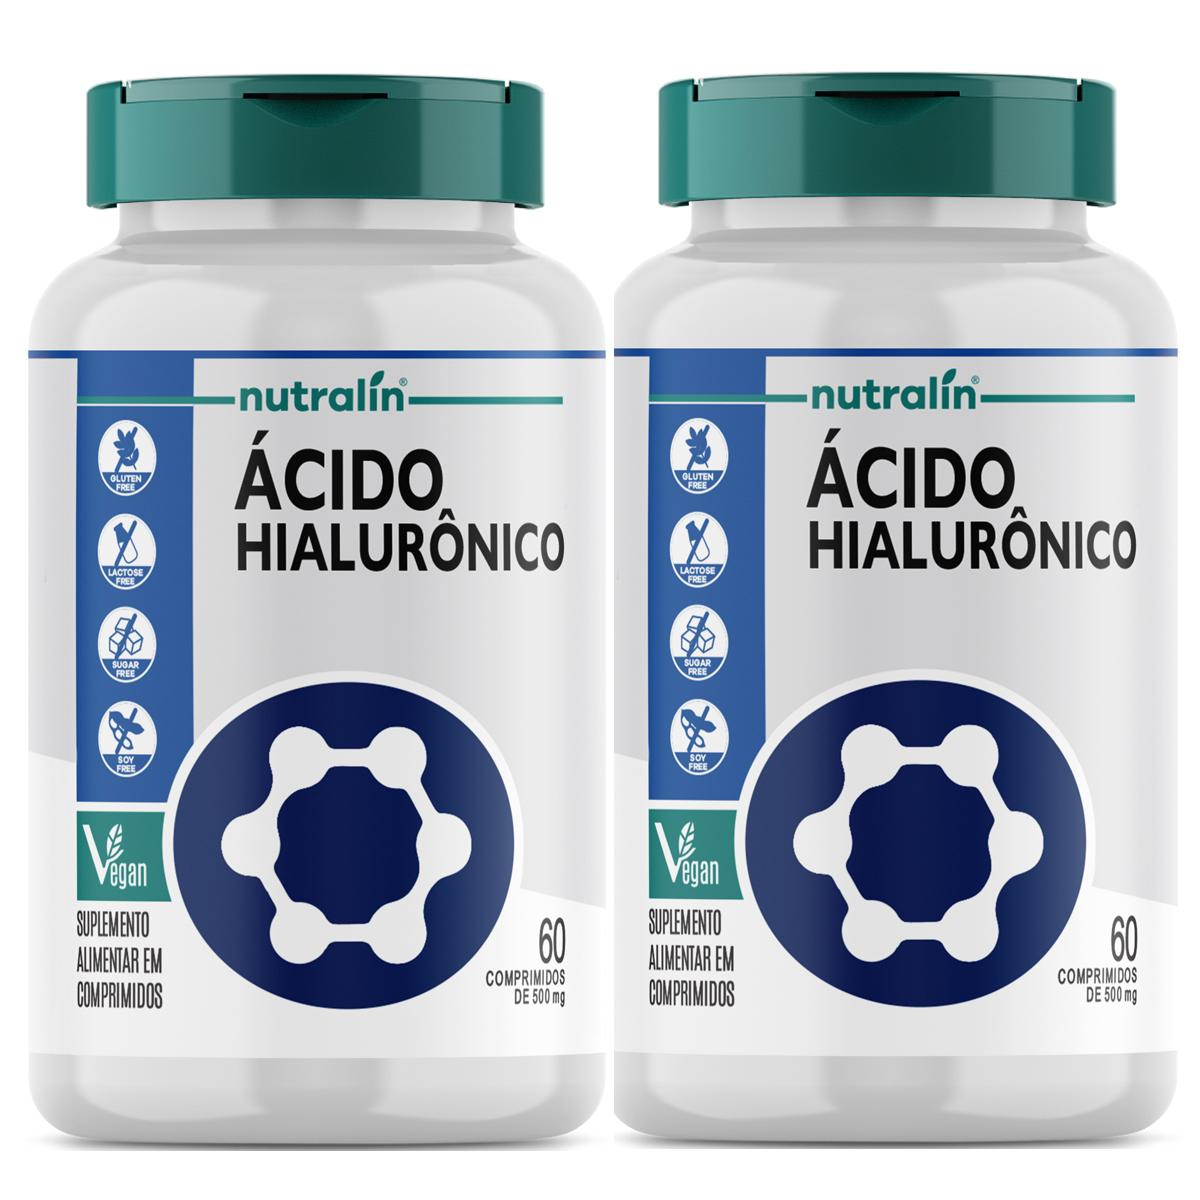 Kit Ácido Hialuronico Nutralin  60 cápsulas  c/ 2 potes